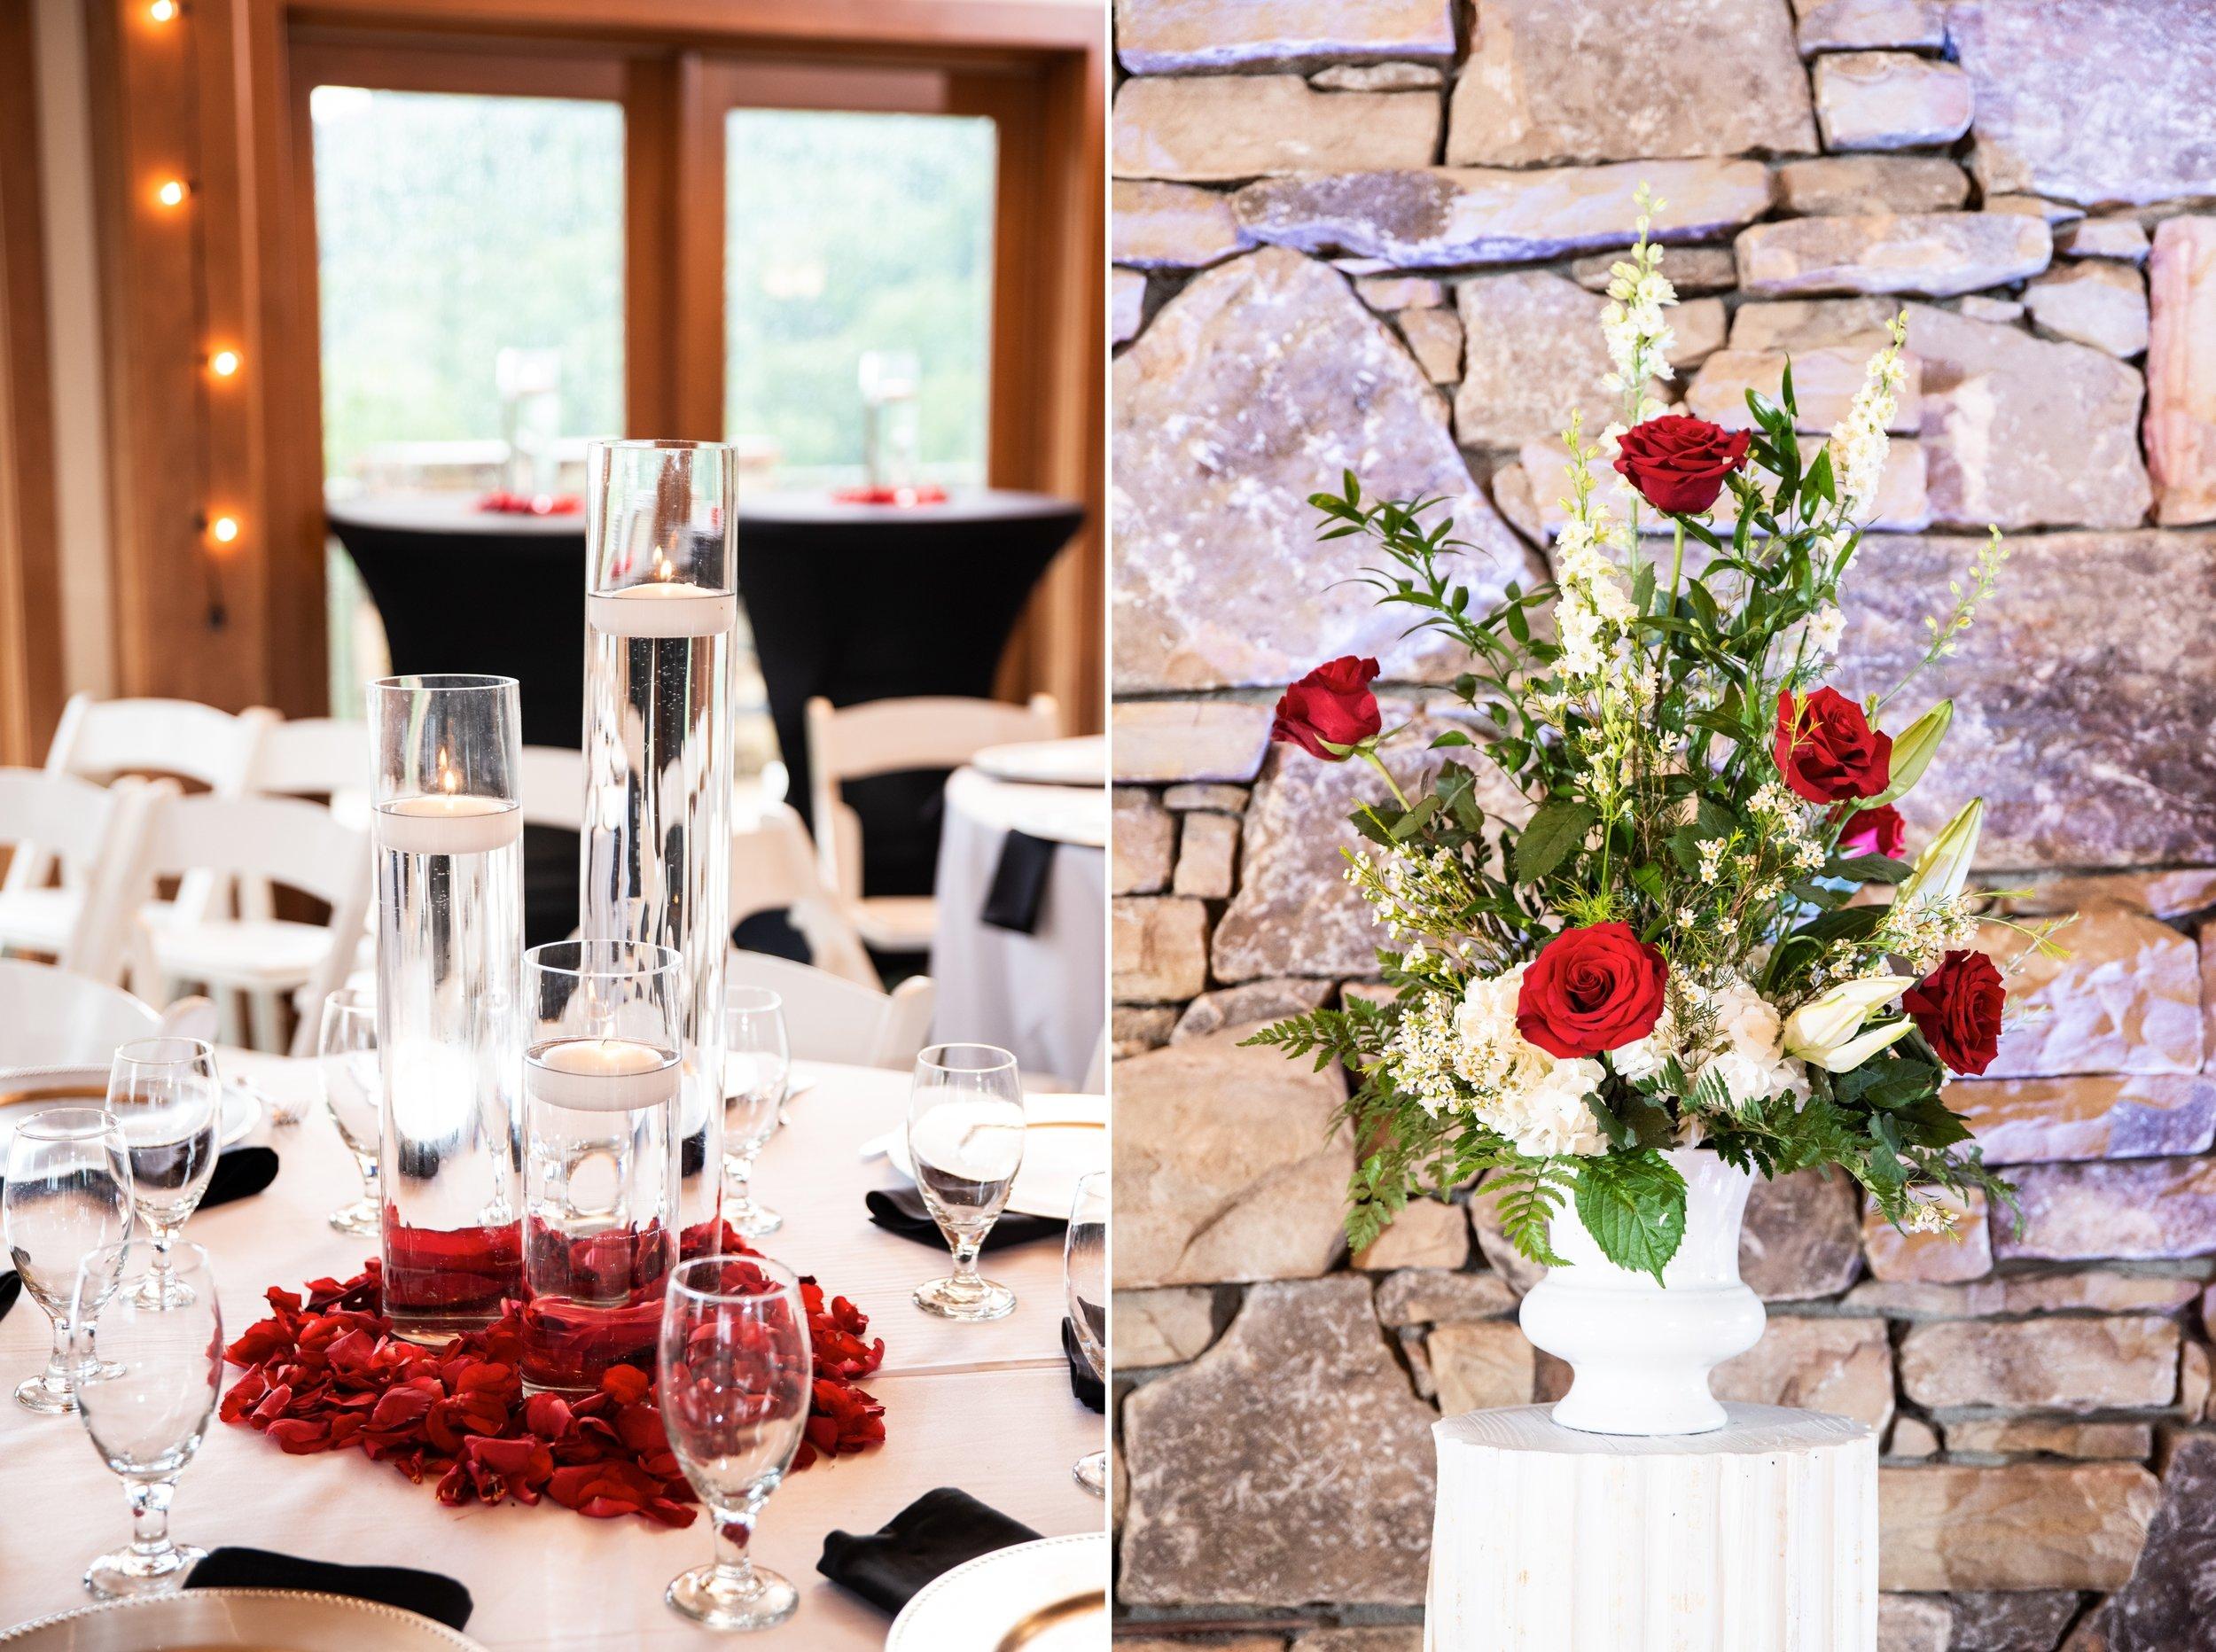 High Vista Weddings - Asheville Wedding 2 2.jpg